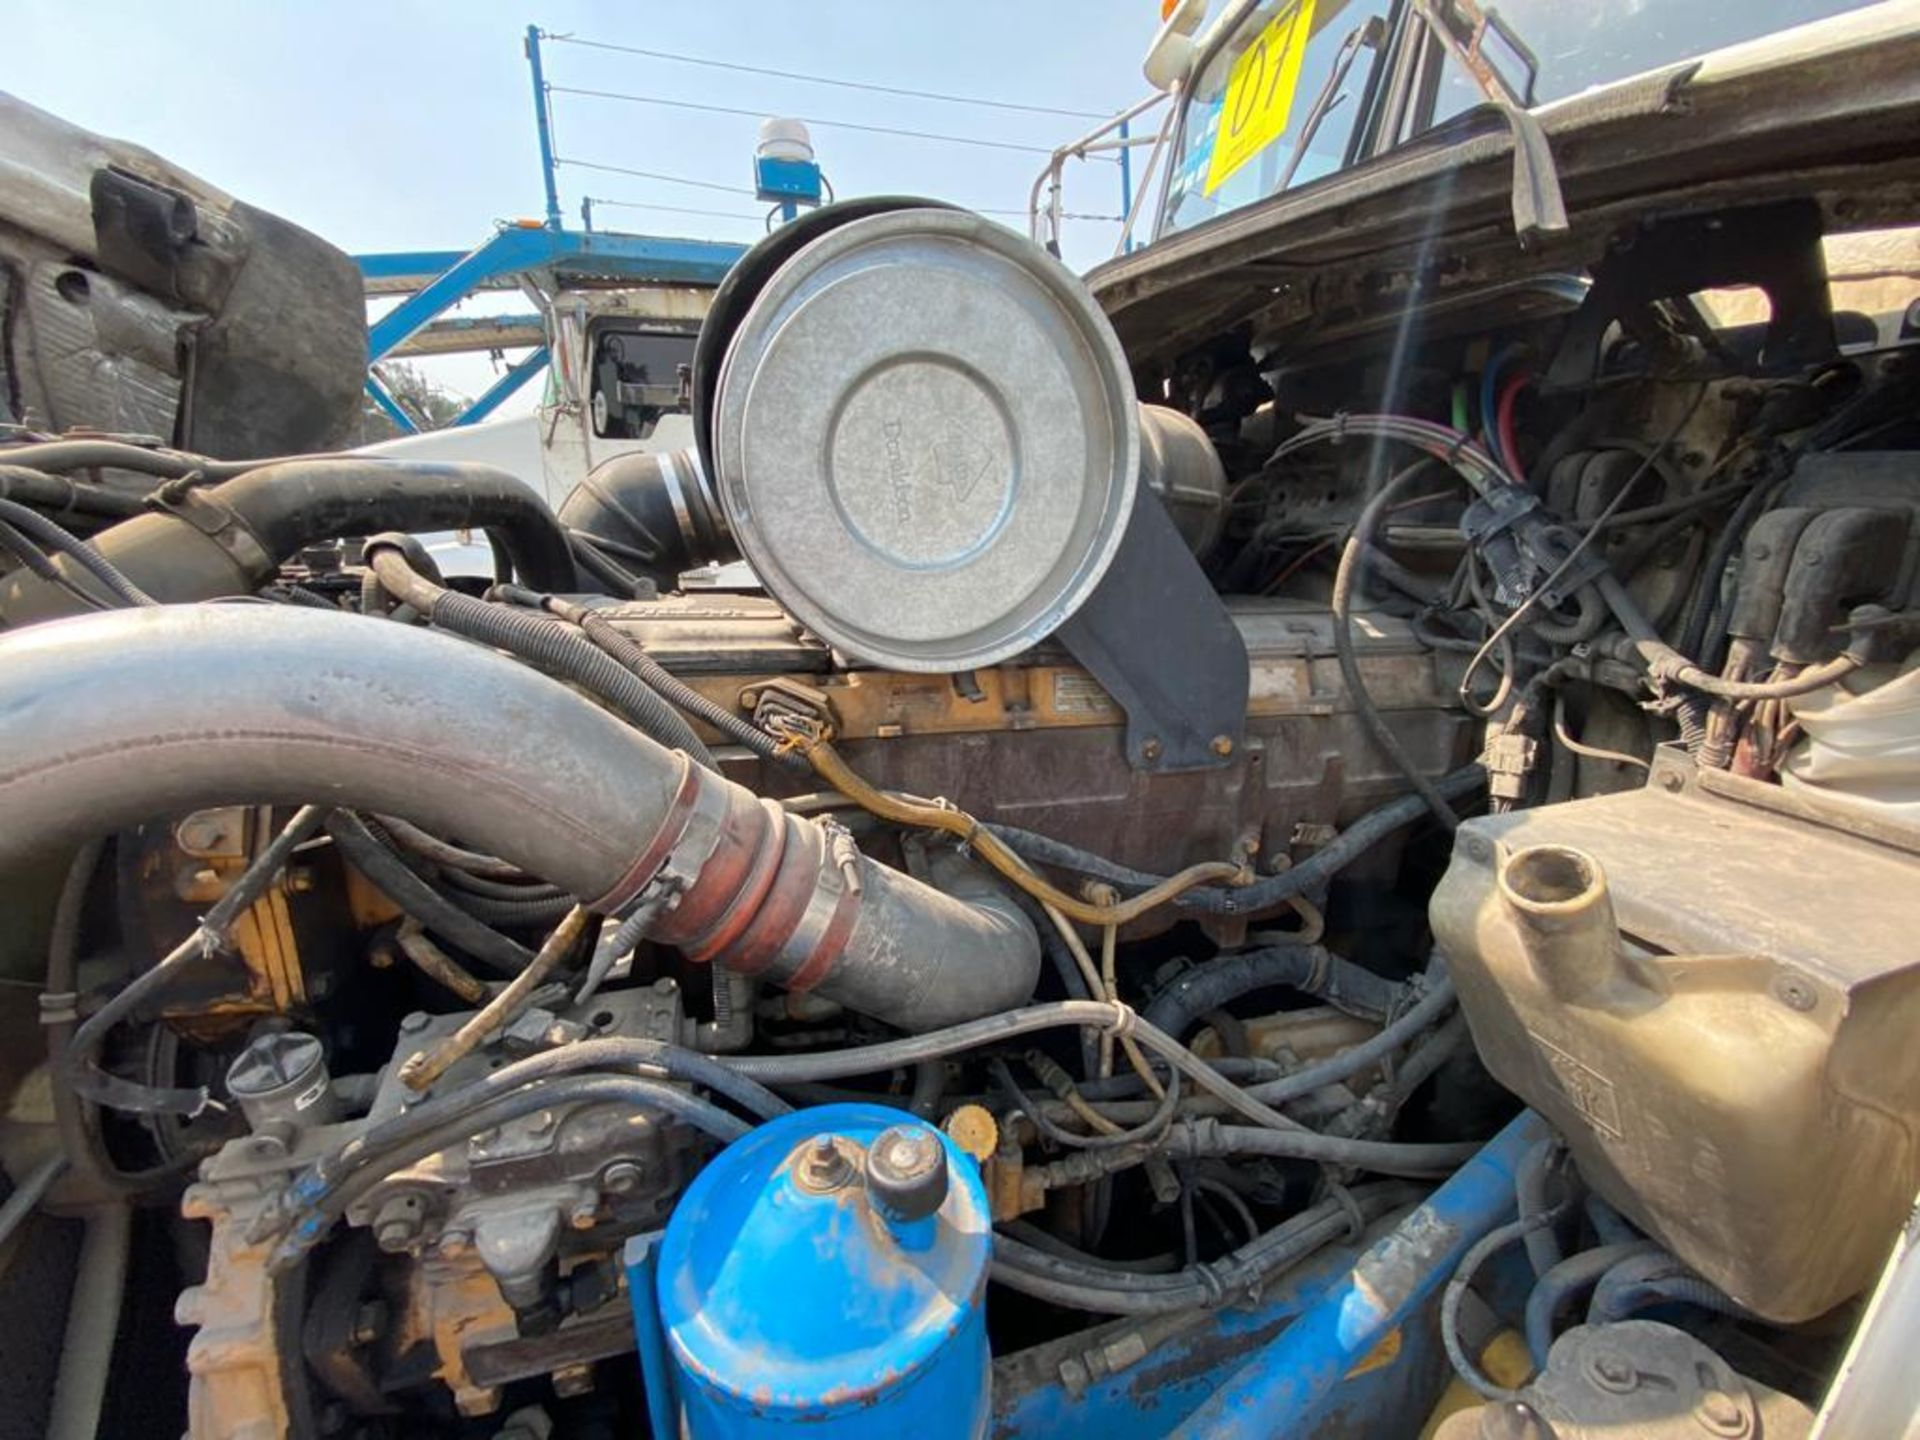 1999 Kenworth Sleeper truck tractor, standard transmission of 18 speeds - Image 70 of 72